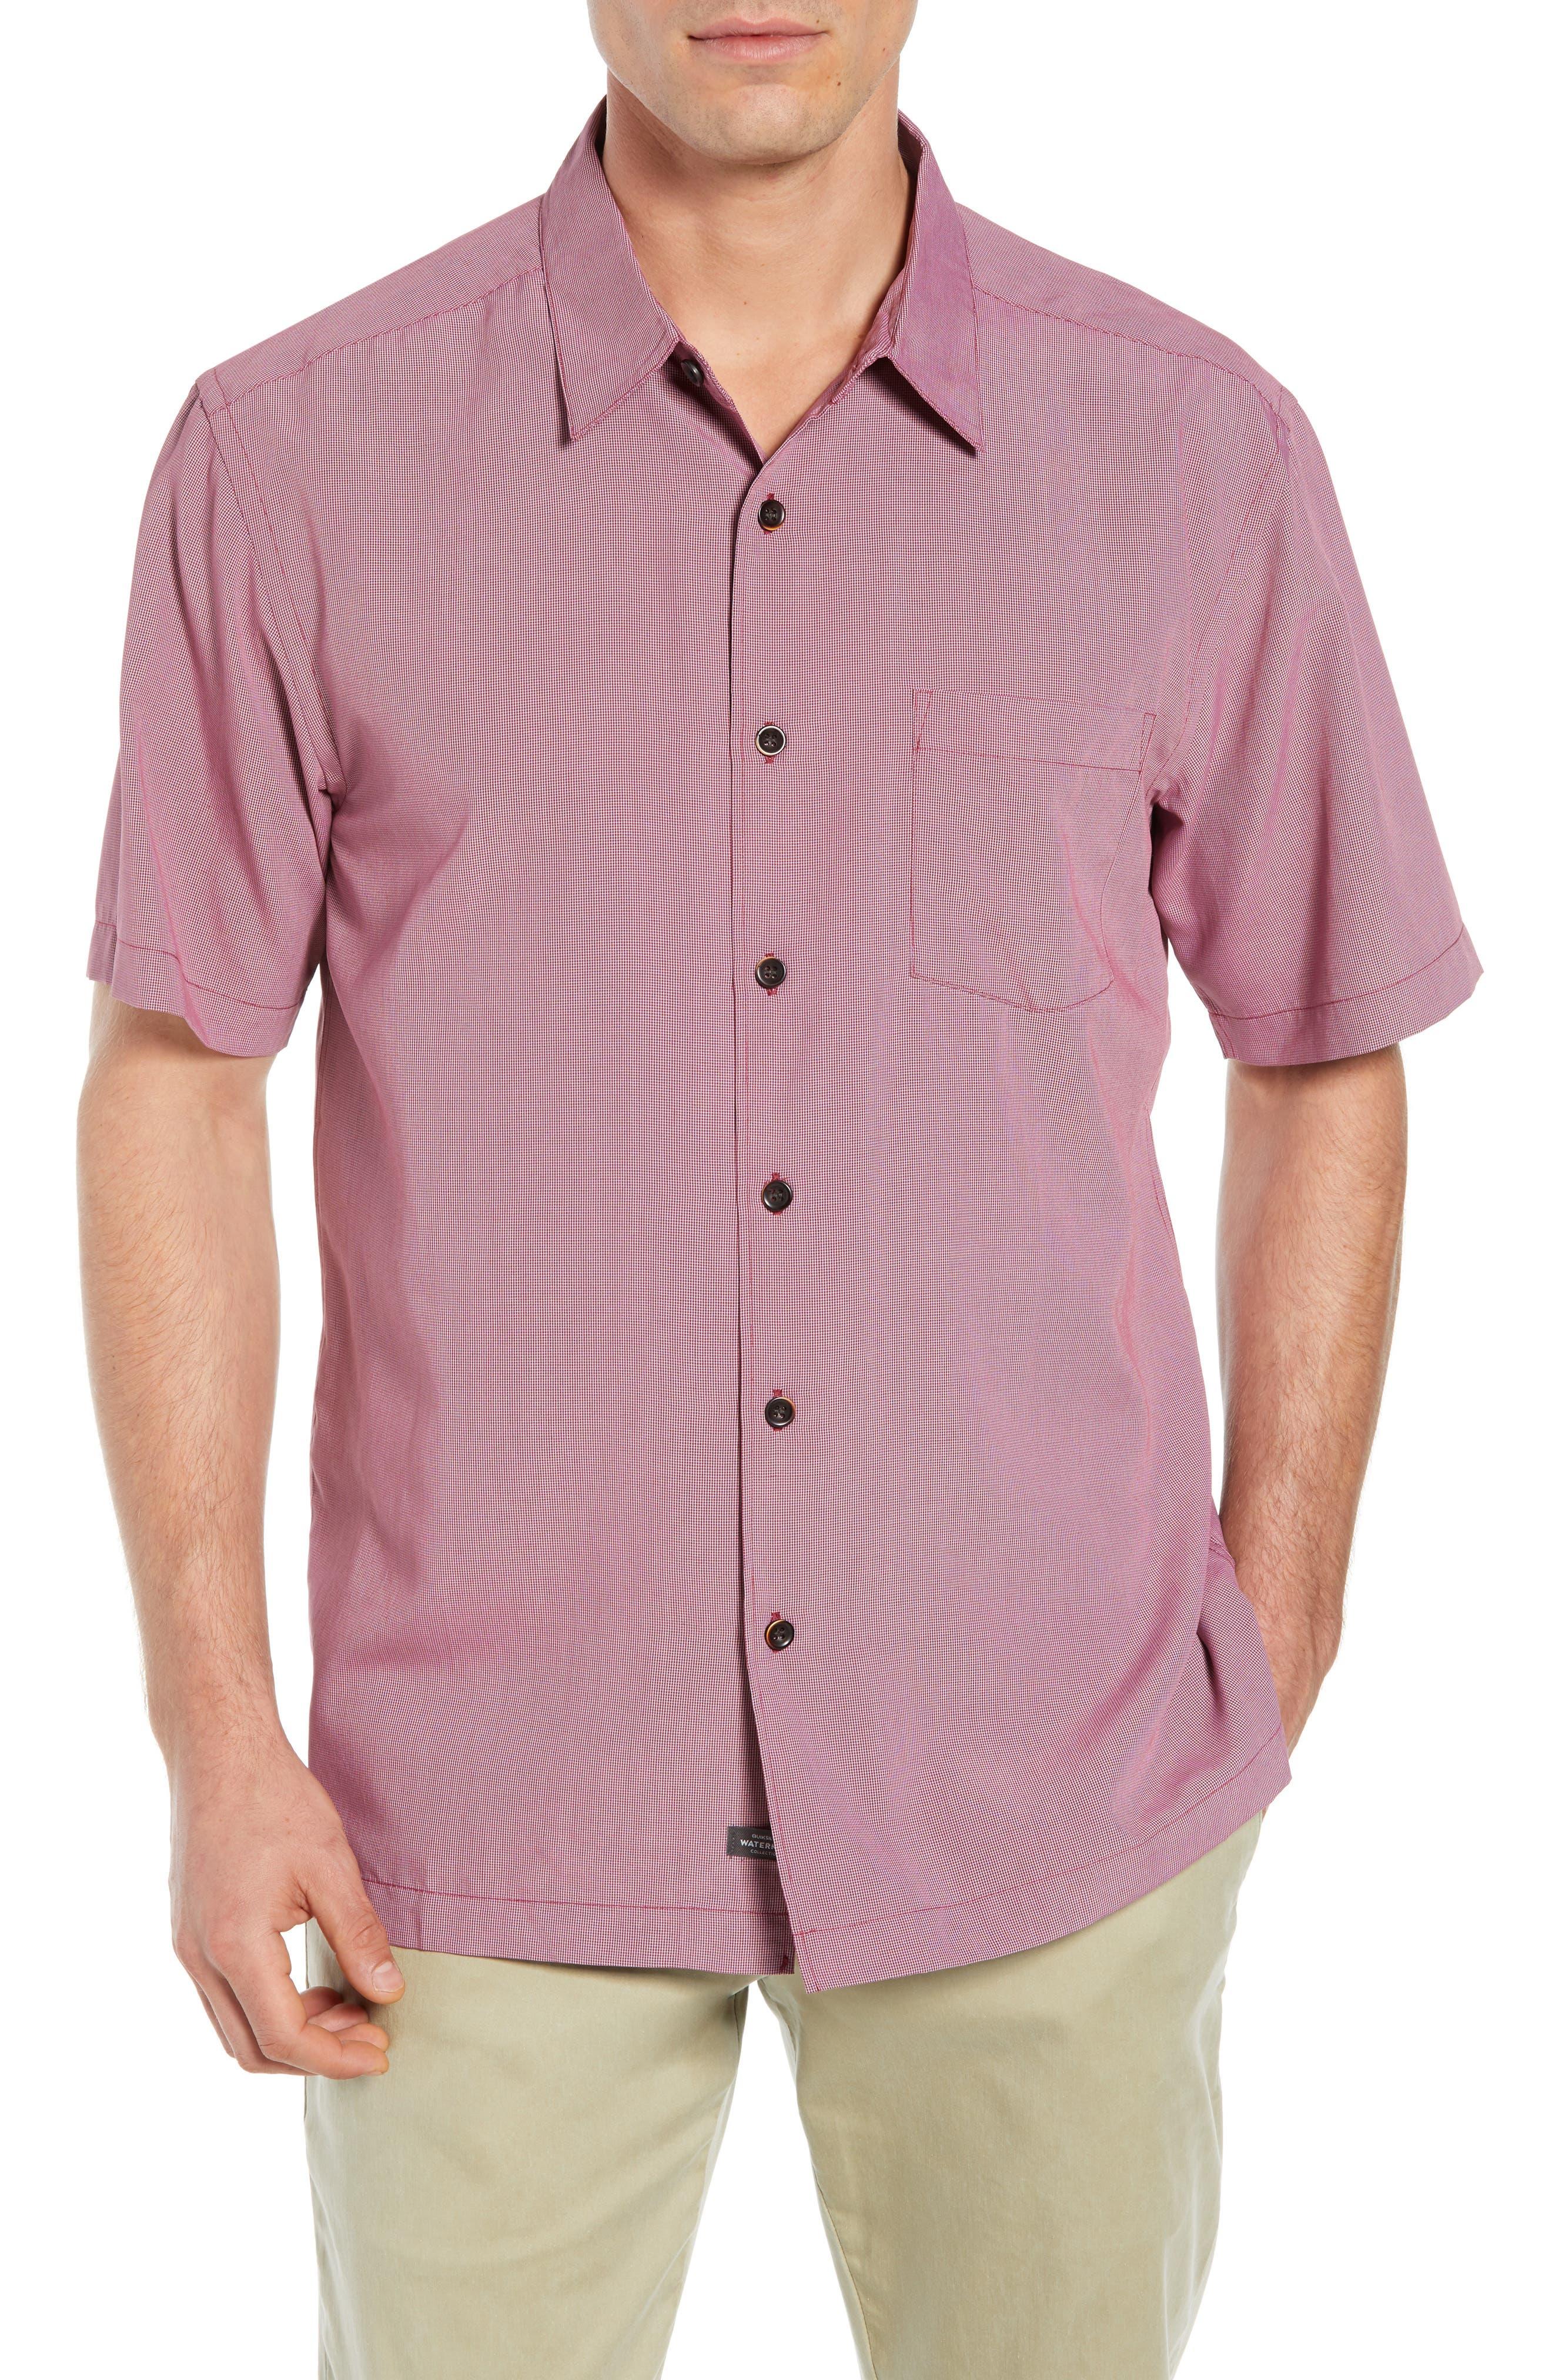 Cane Island Classic Fit Camp Shirt,                         Main,                         color, TAWNY PORT